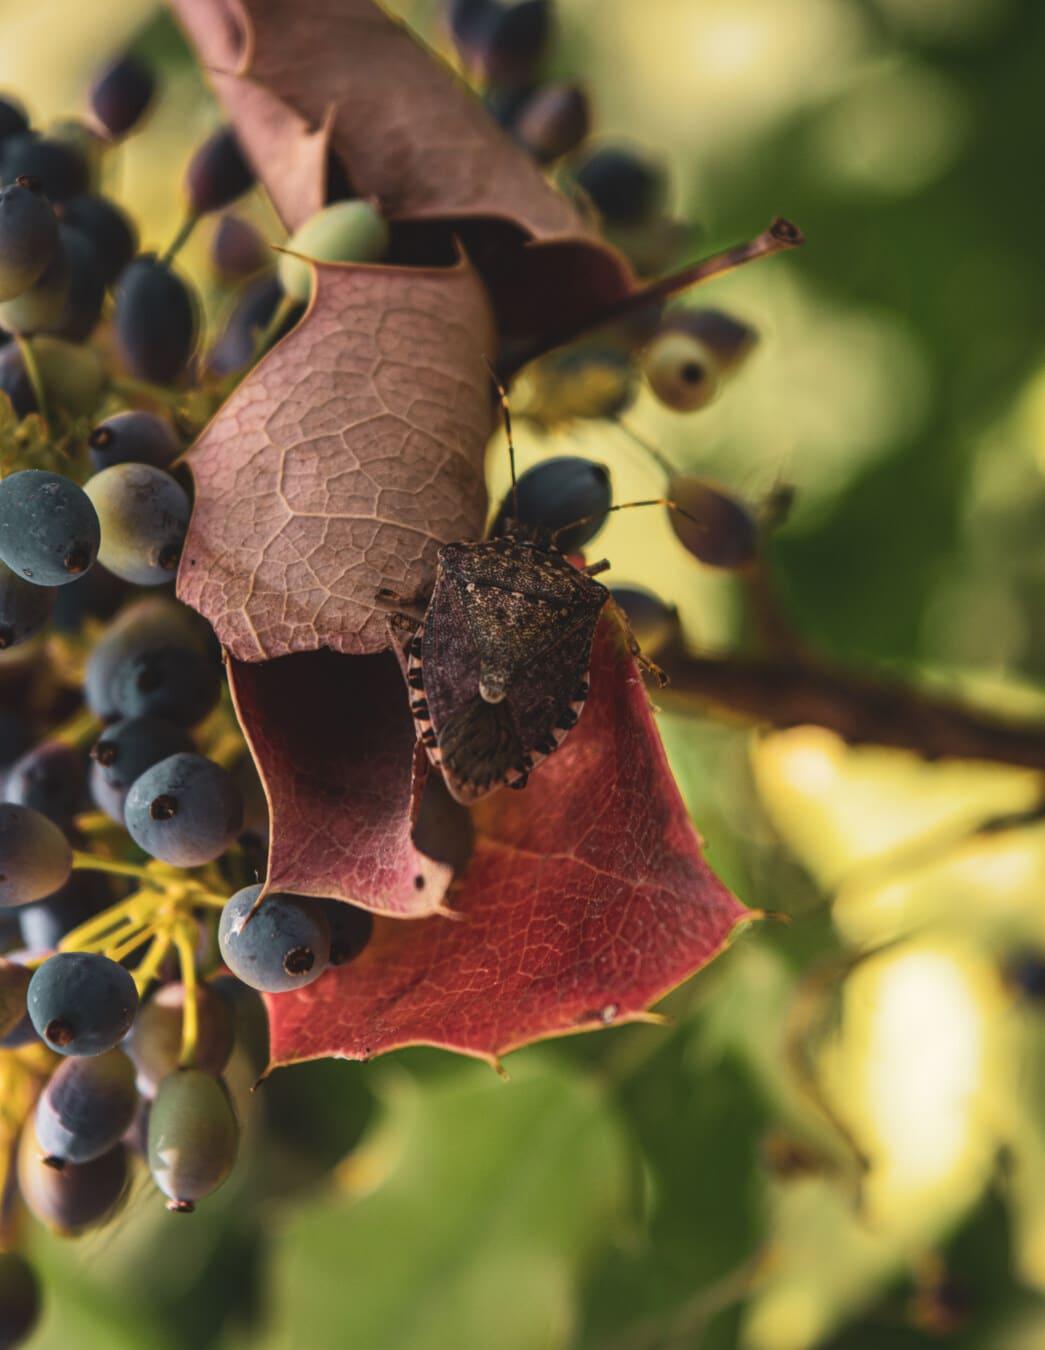 hellbraun, Beeren, Blatt, rötlich, aus nächster Nähe, Käfer, Insekt, Natur, Flora, Farbe